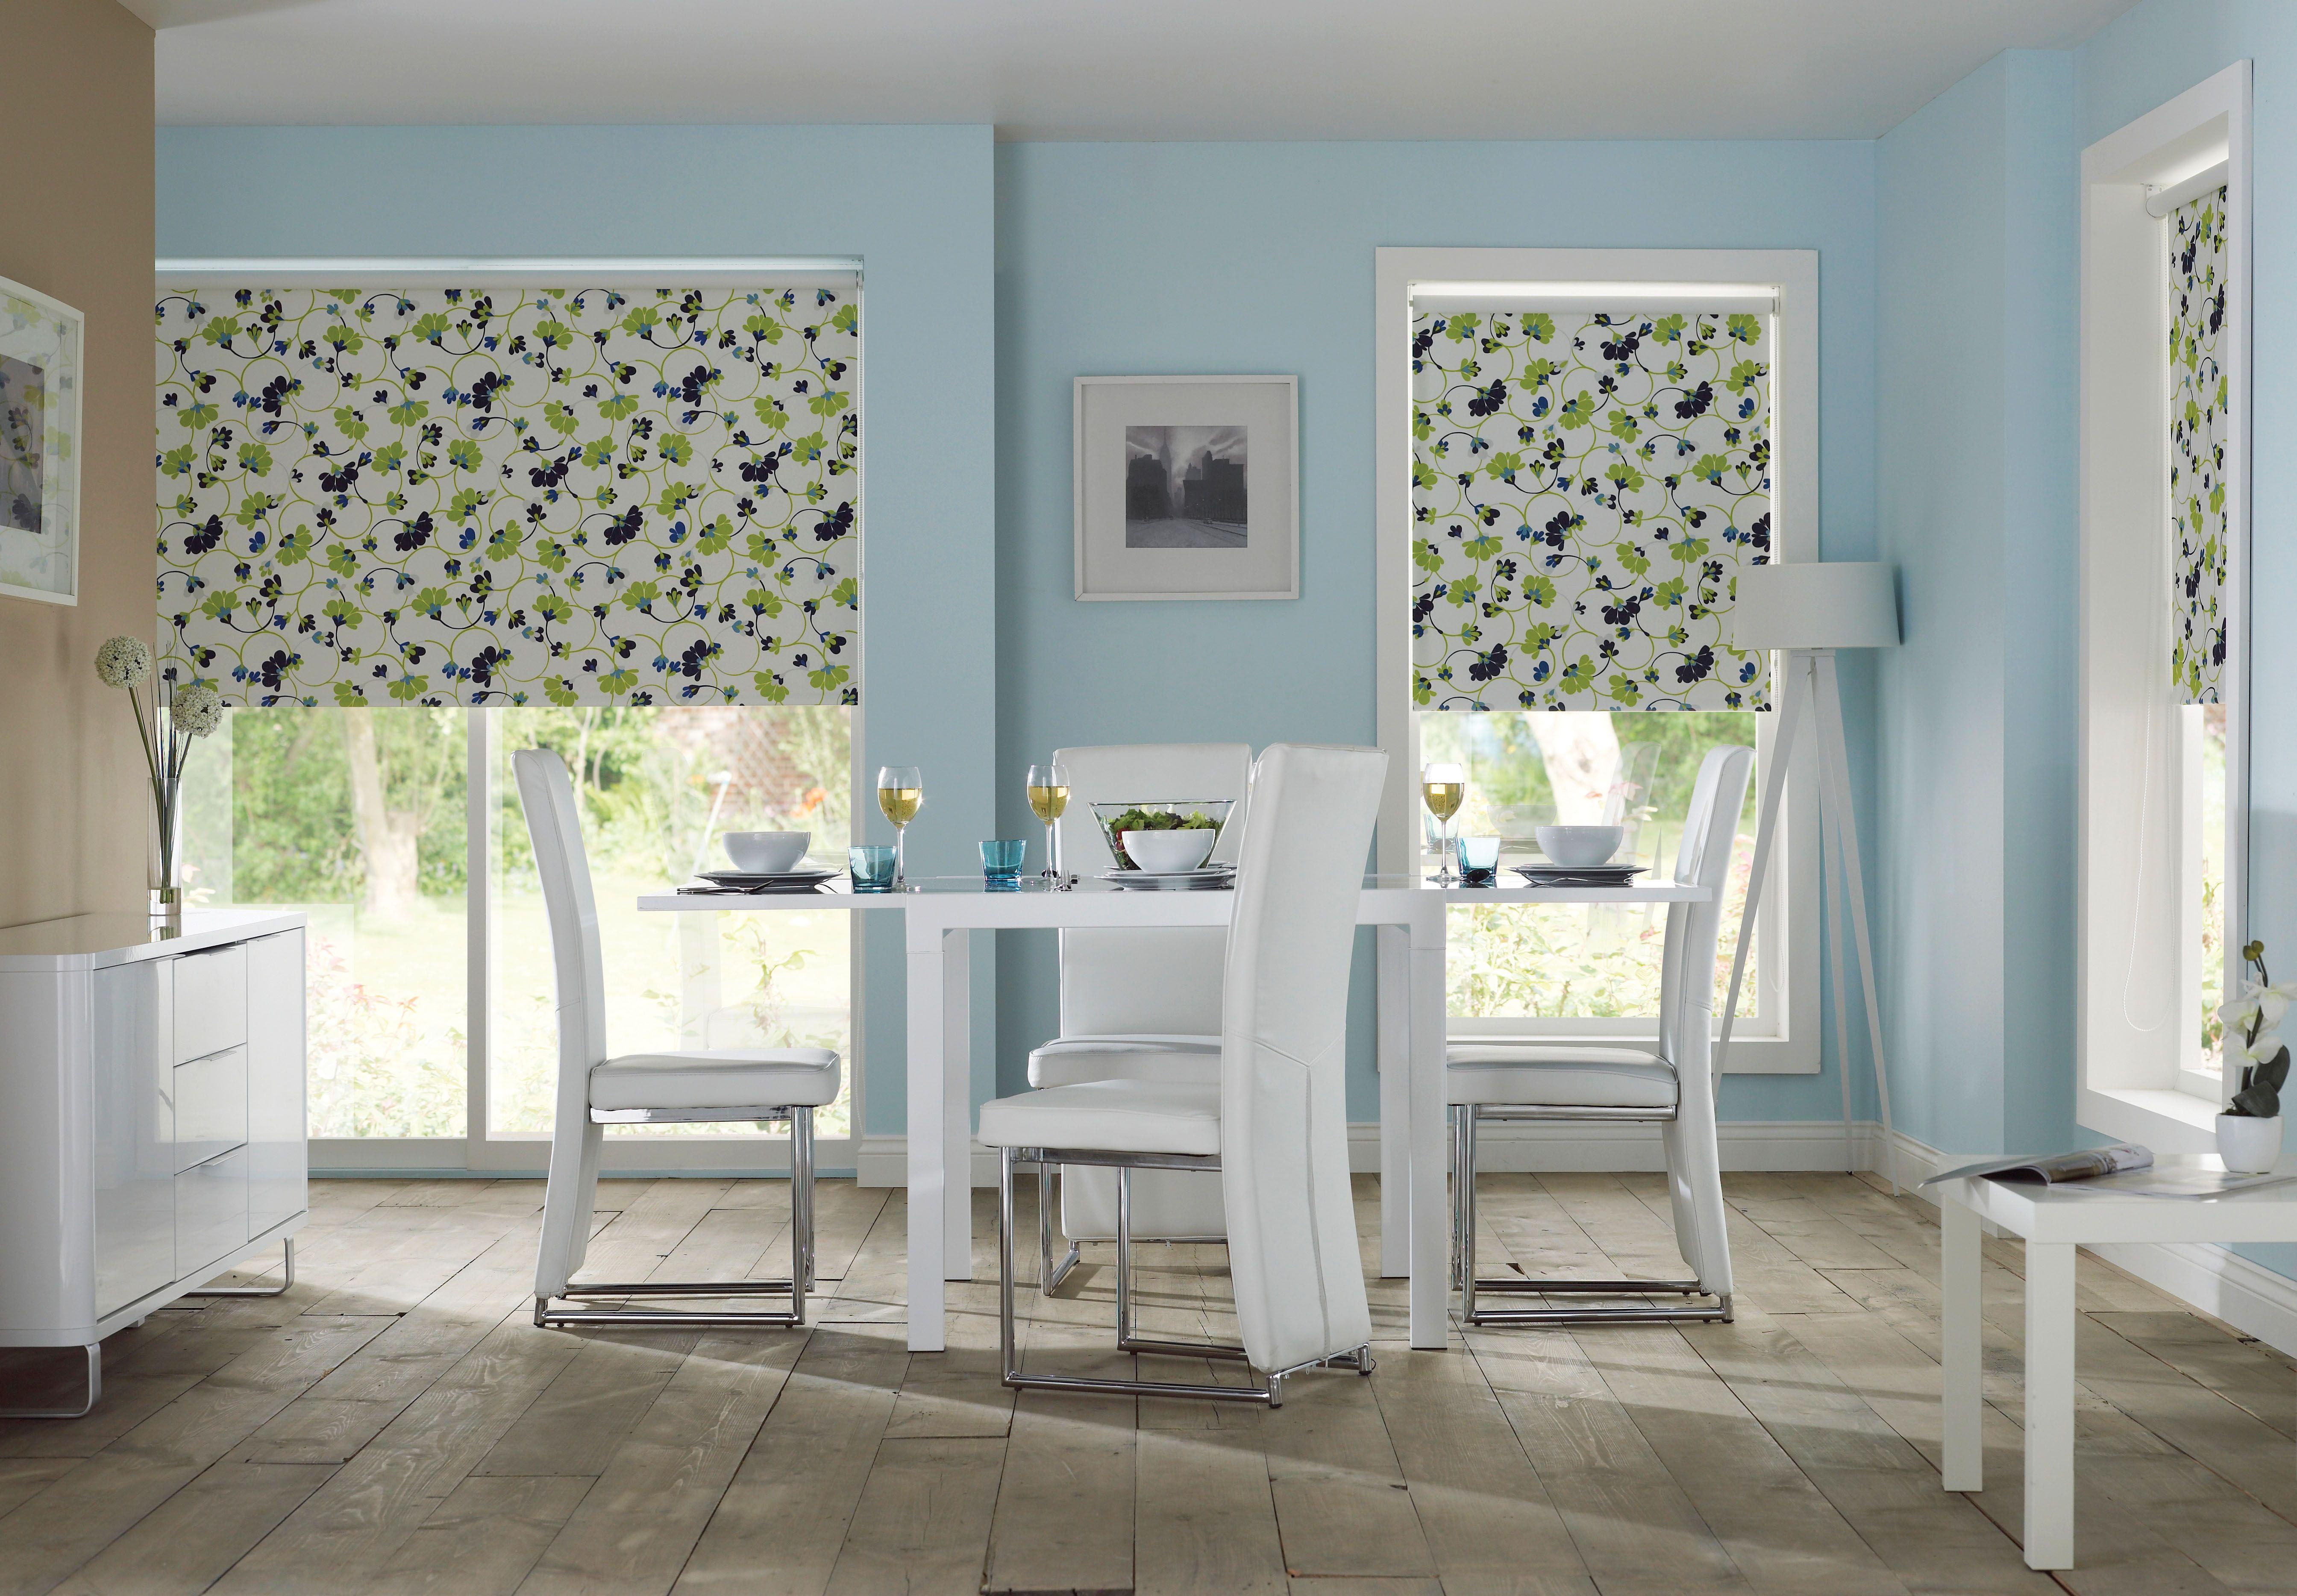 Boutique Breeze Kitchen Window Blind | Roller Blinds | Pinterest ...